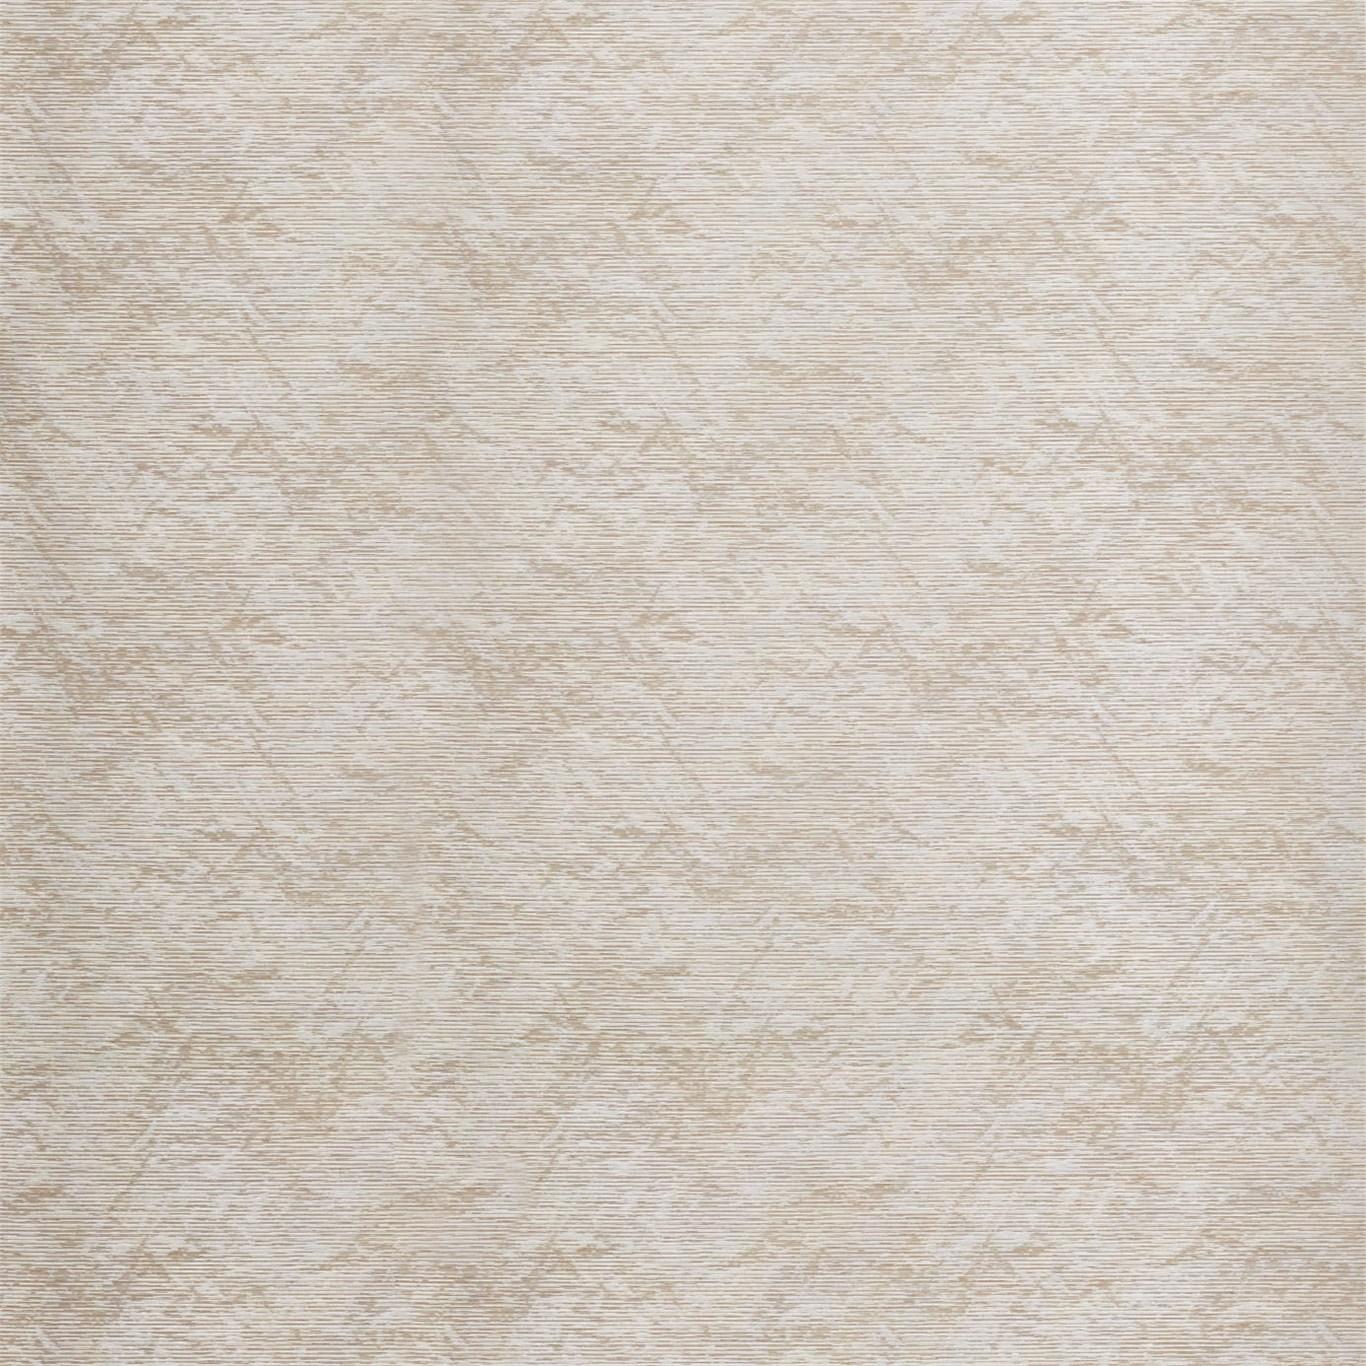 Английские обои Zoffany,  коллекция Akaishi, артикул312501